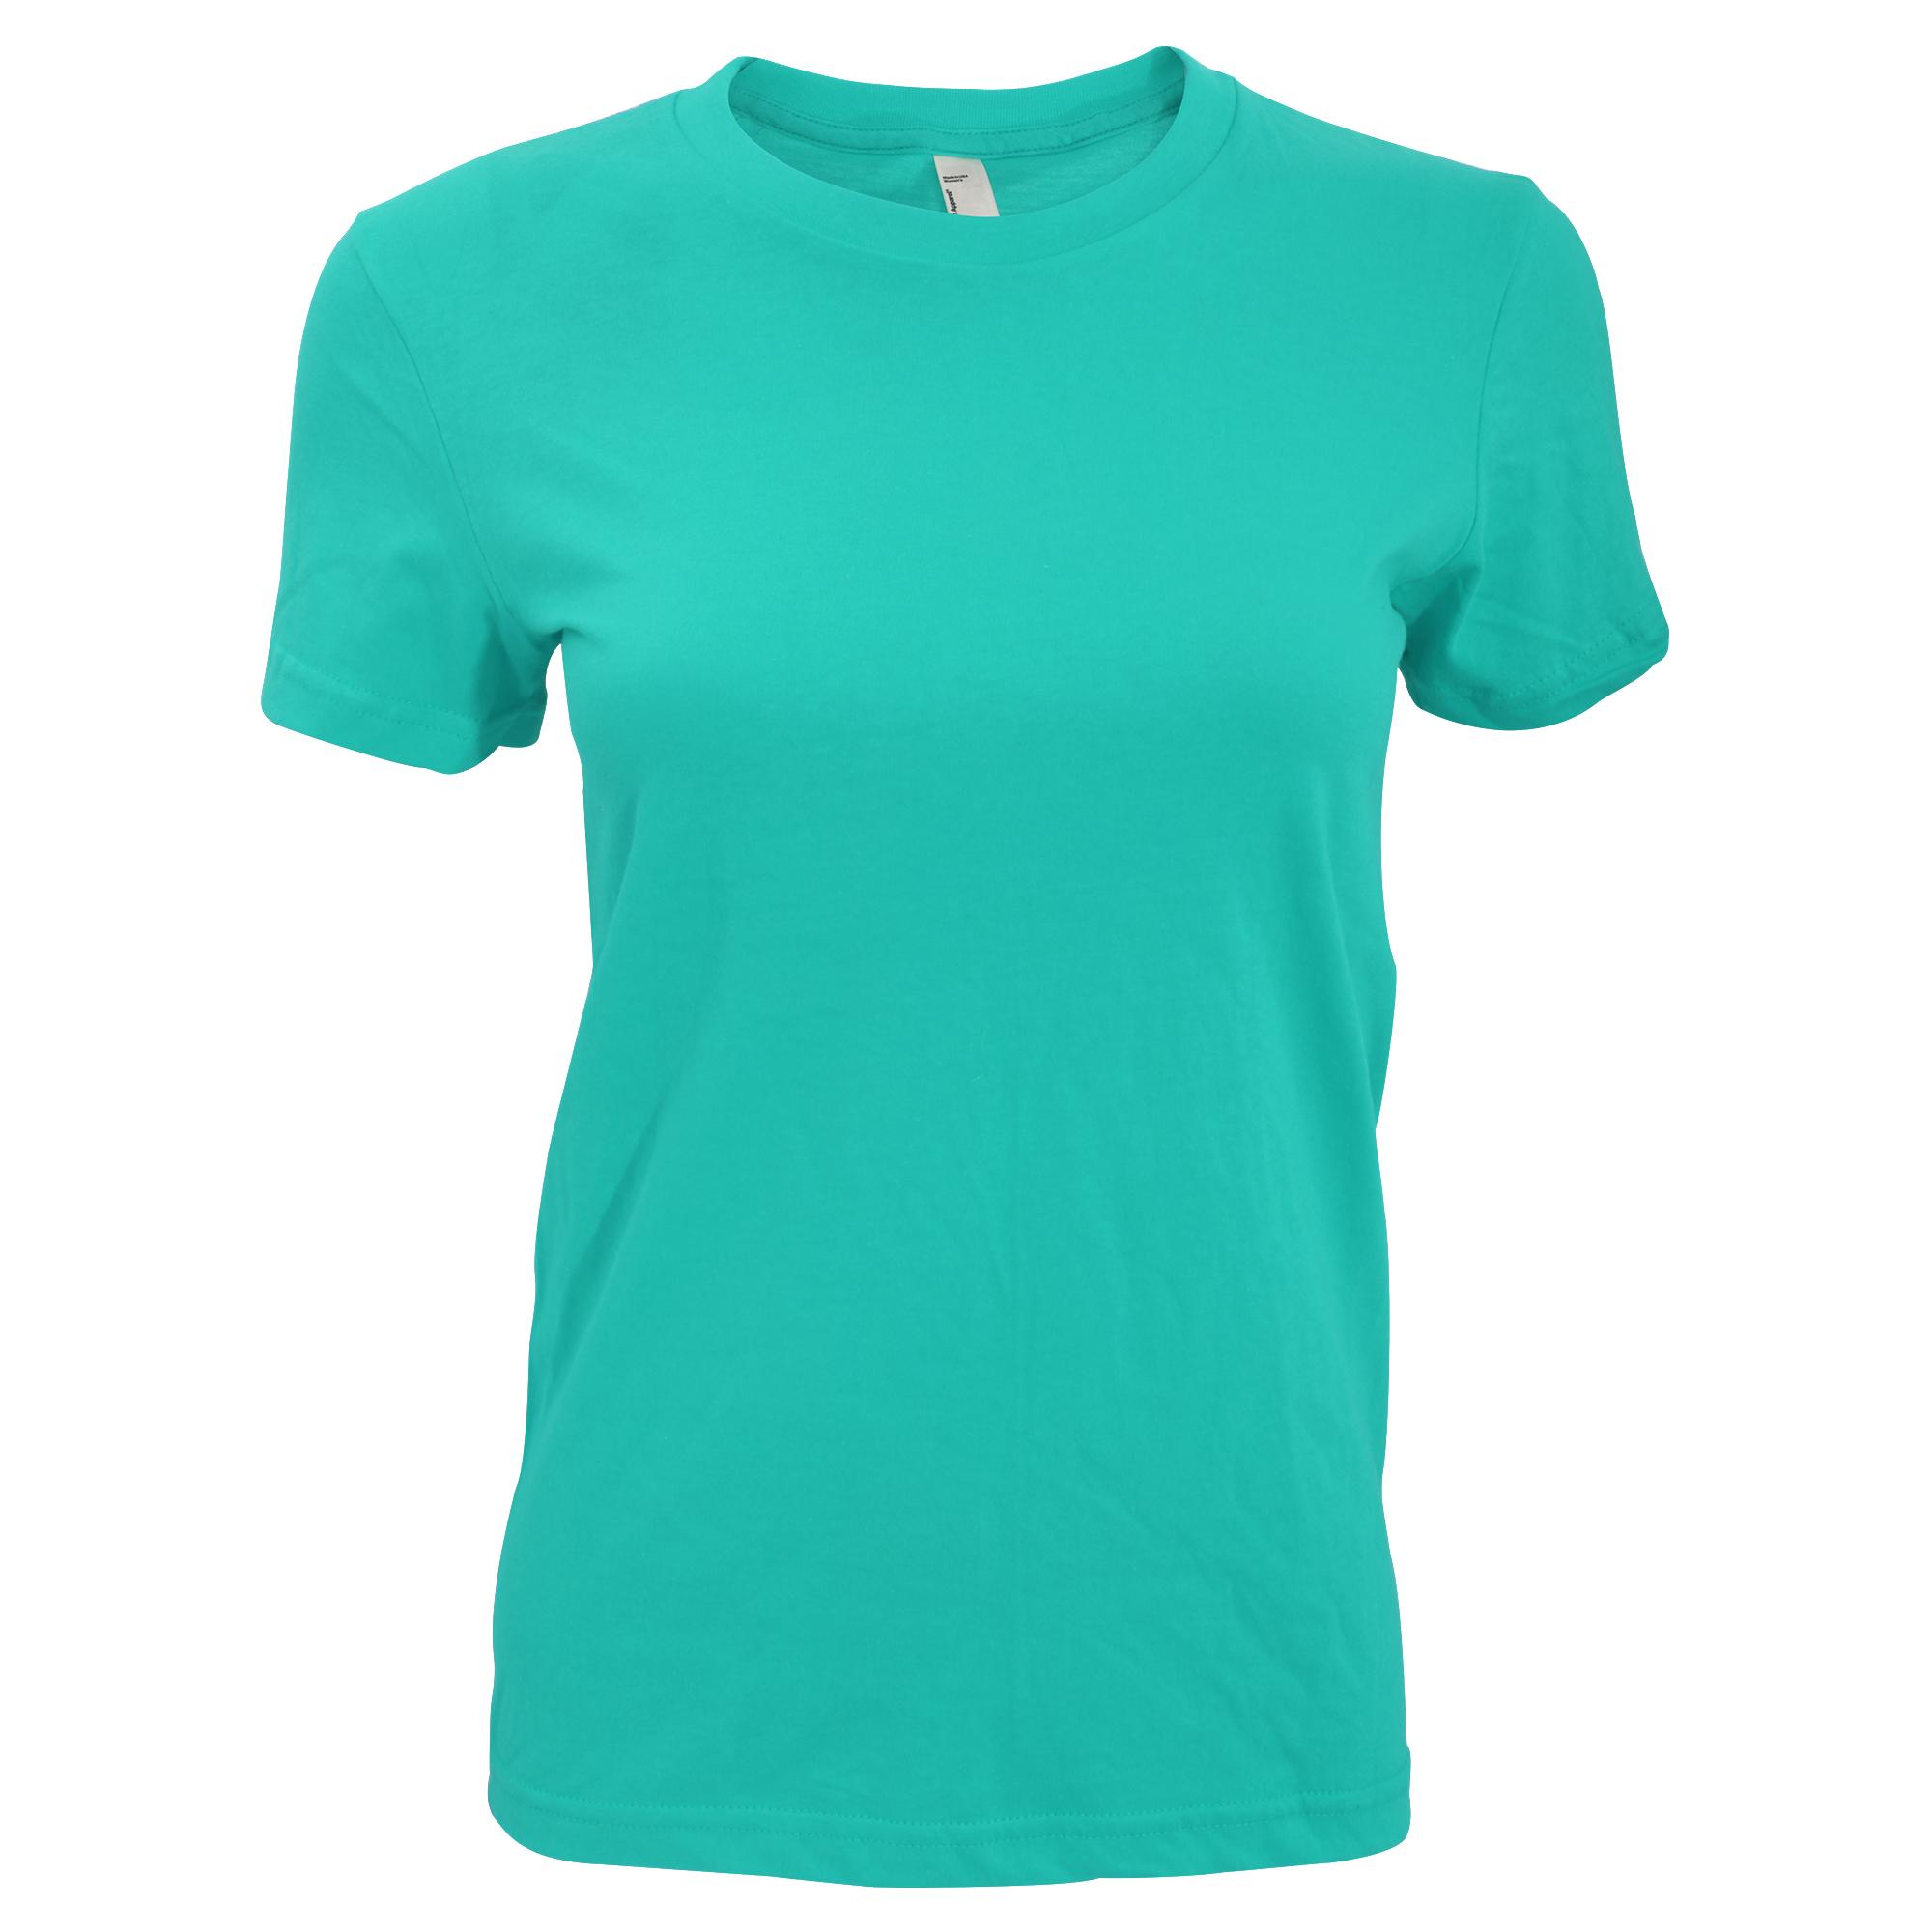 American Apparel- Camiseta lisa de manga corta para mujer (RW4036 ... e69e3fb340d